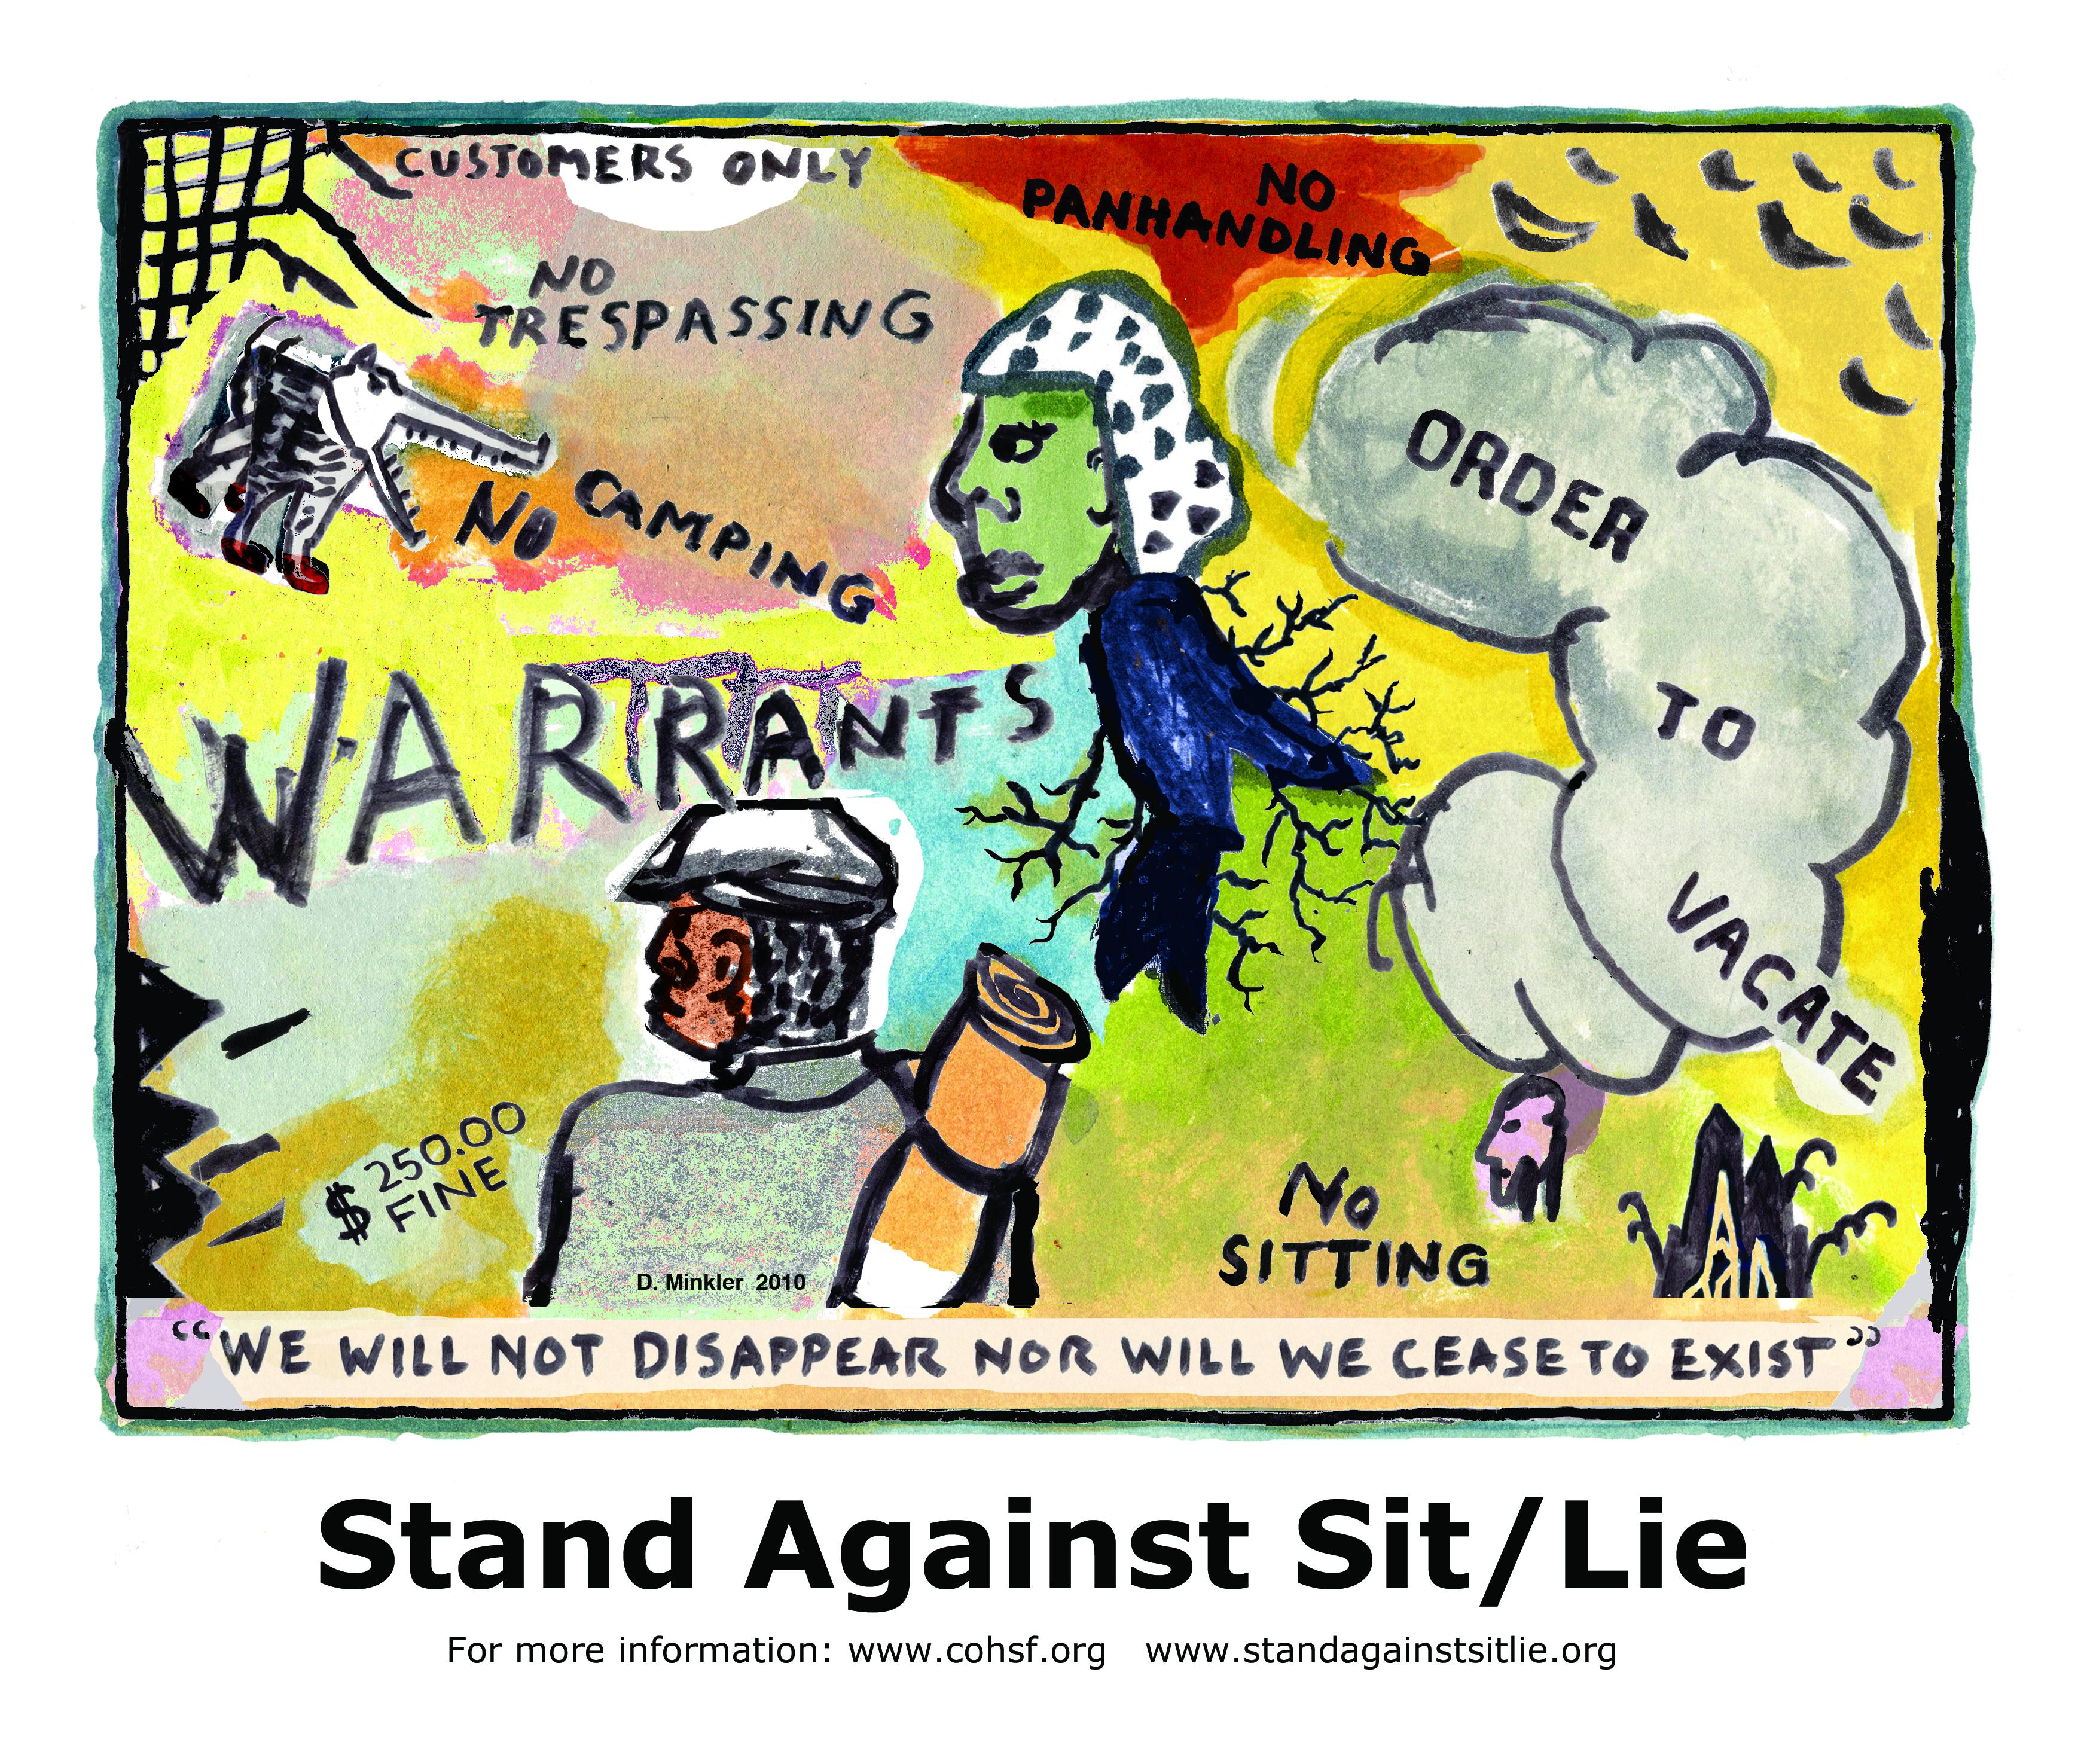 Stand against Sit/Lie